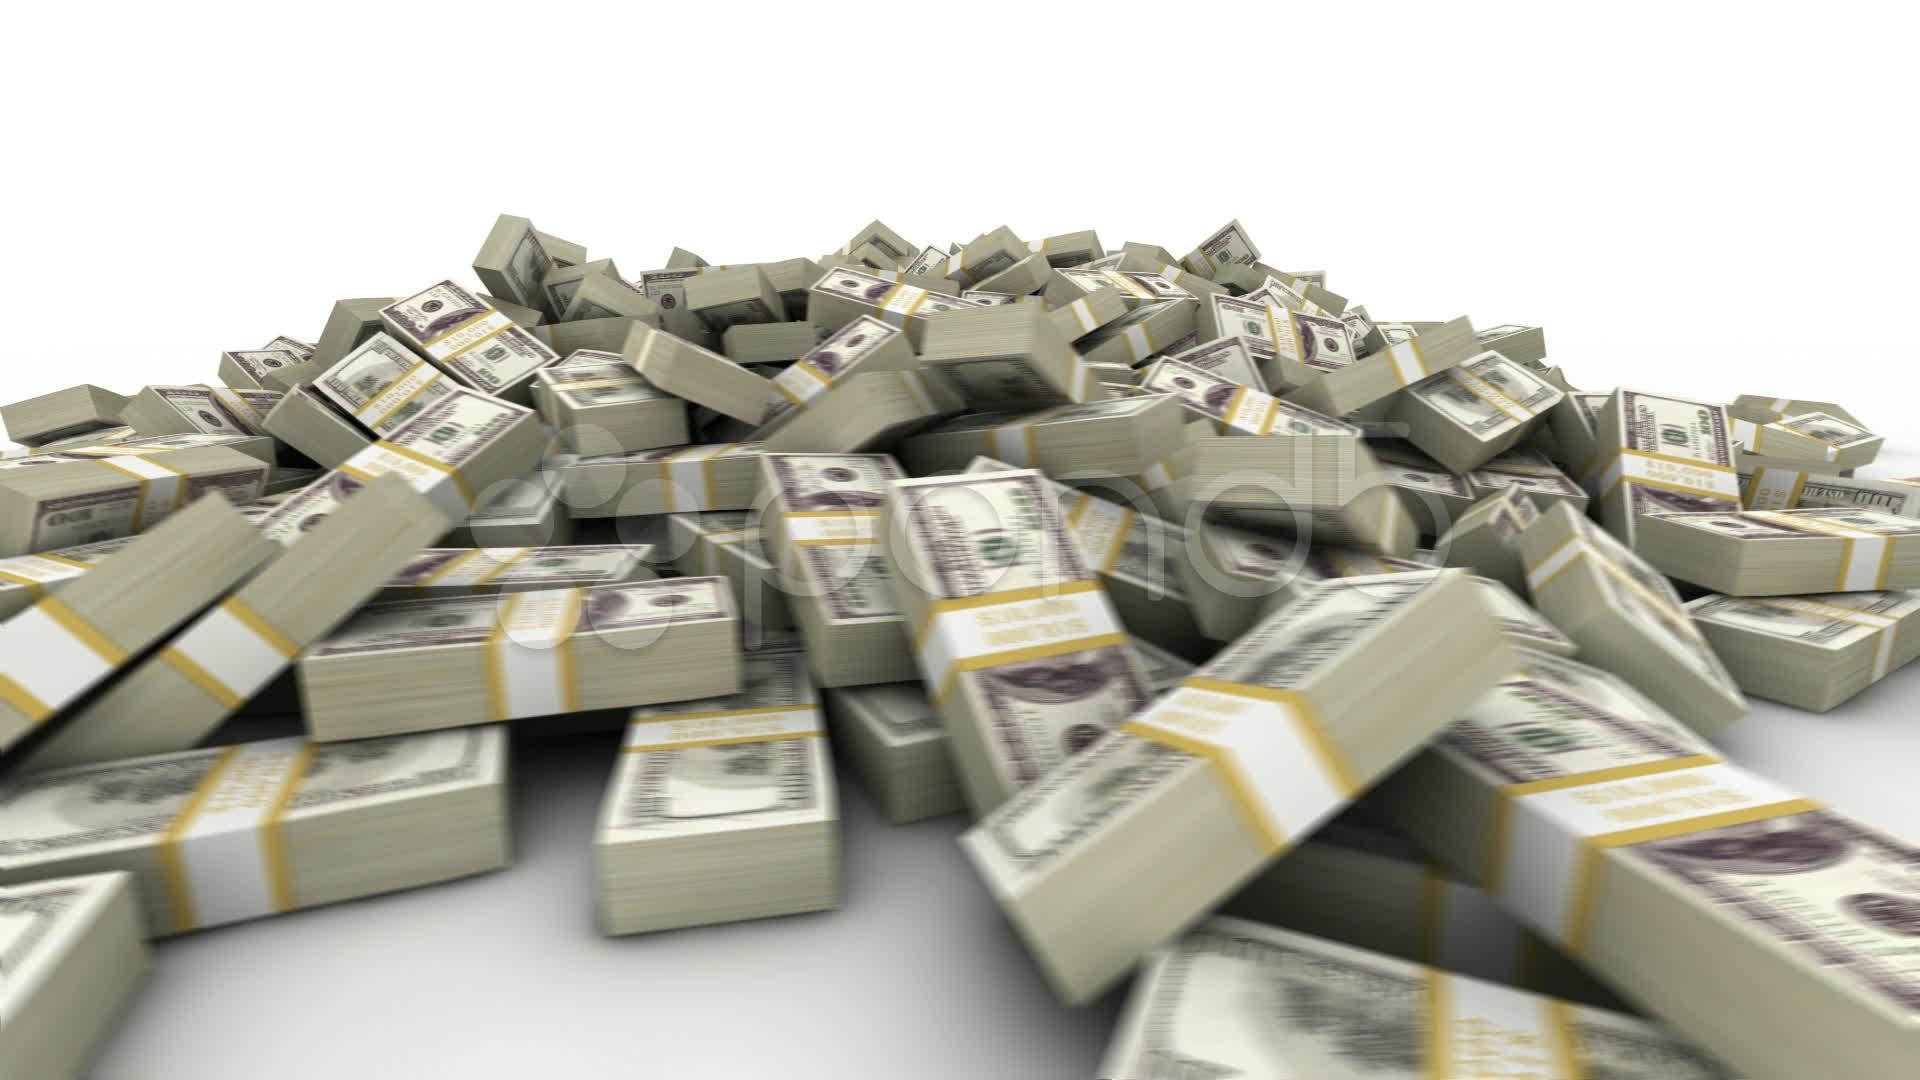 Audio Car Wallpaper Download Hundred Dollar Bill Pile Stock Video 8982963 Hd Stock